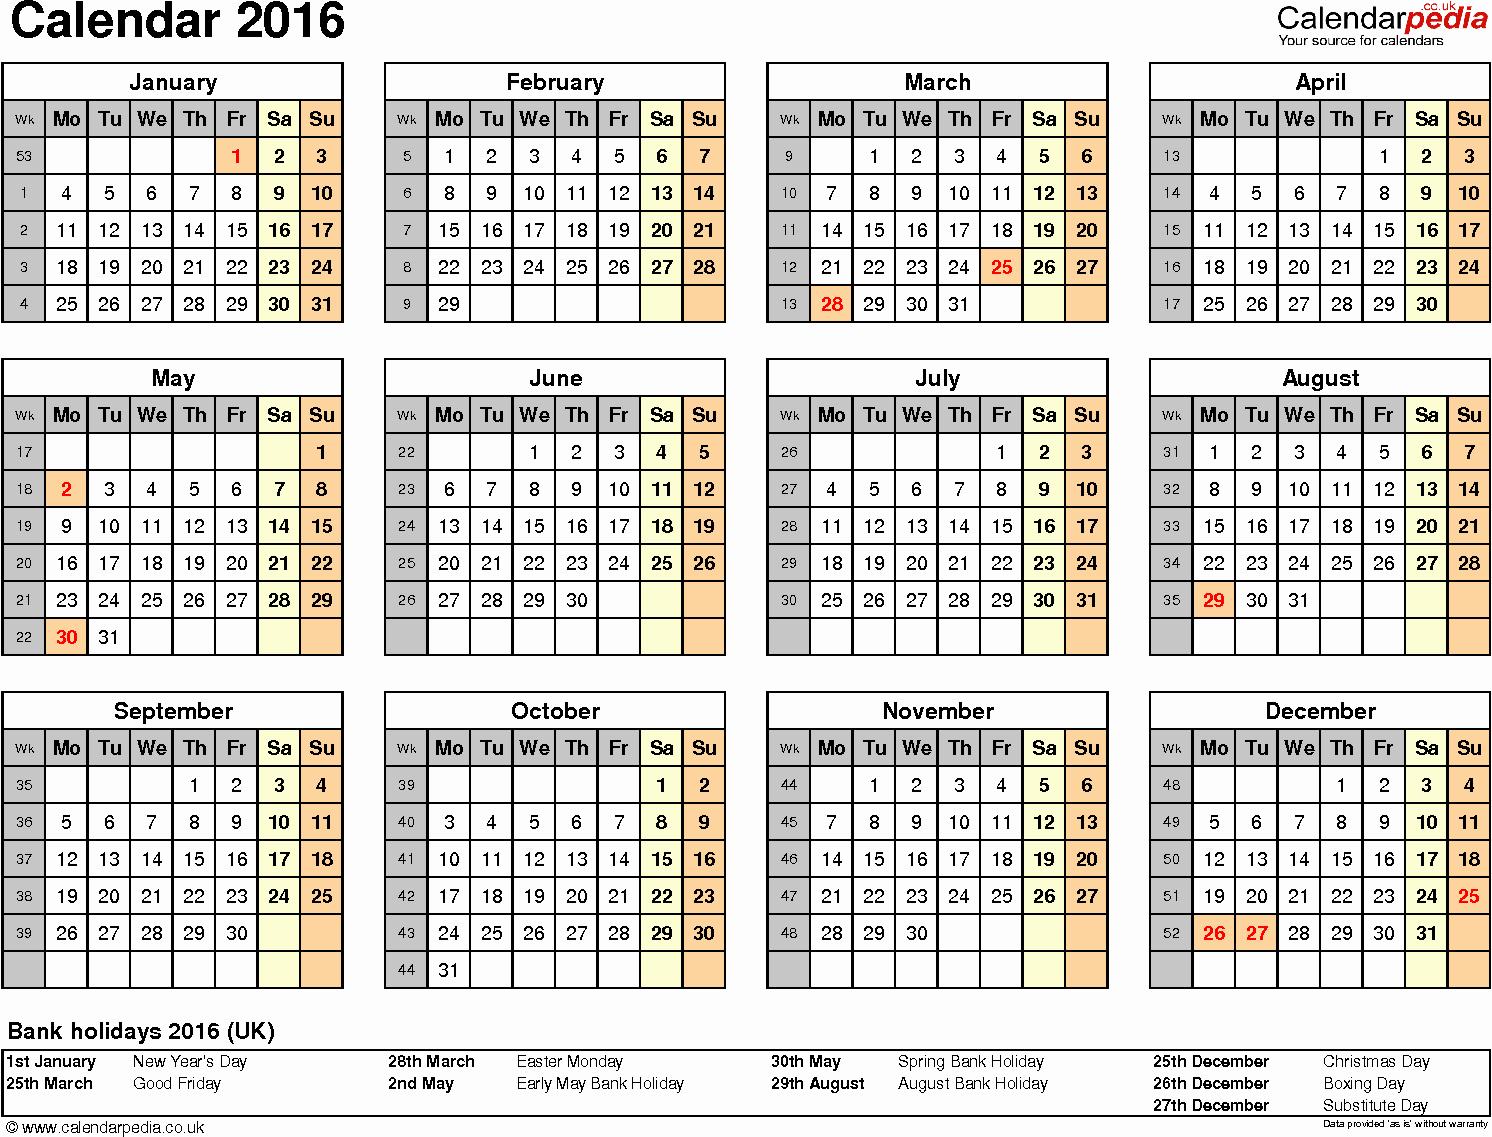 Calendar Templates for Ms Word Fresh Calendar 2016 Uk 16 Free Printable Word Templates